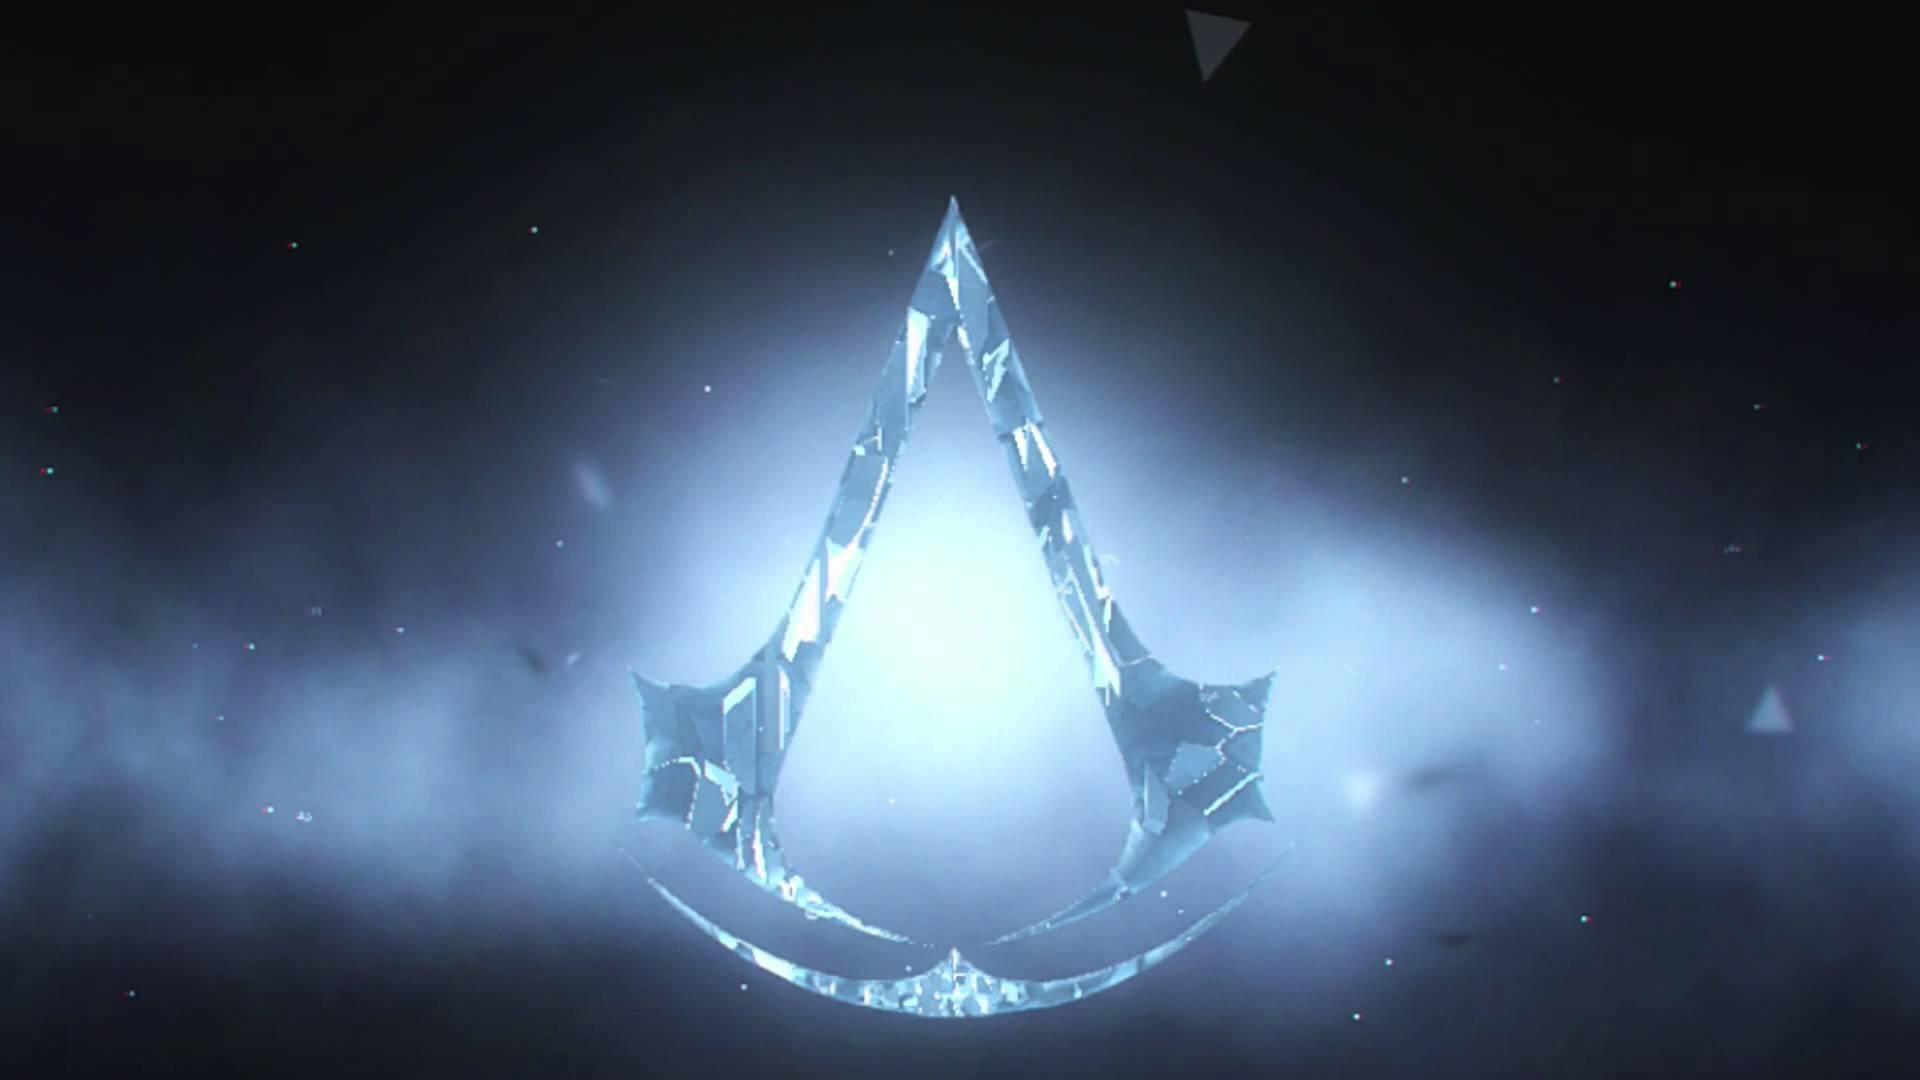 2560x1440 Download Assassins Creed 3 Logo Wallpaper 5834 Full Size